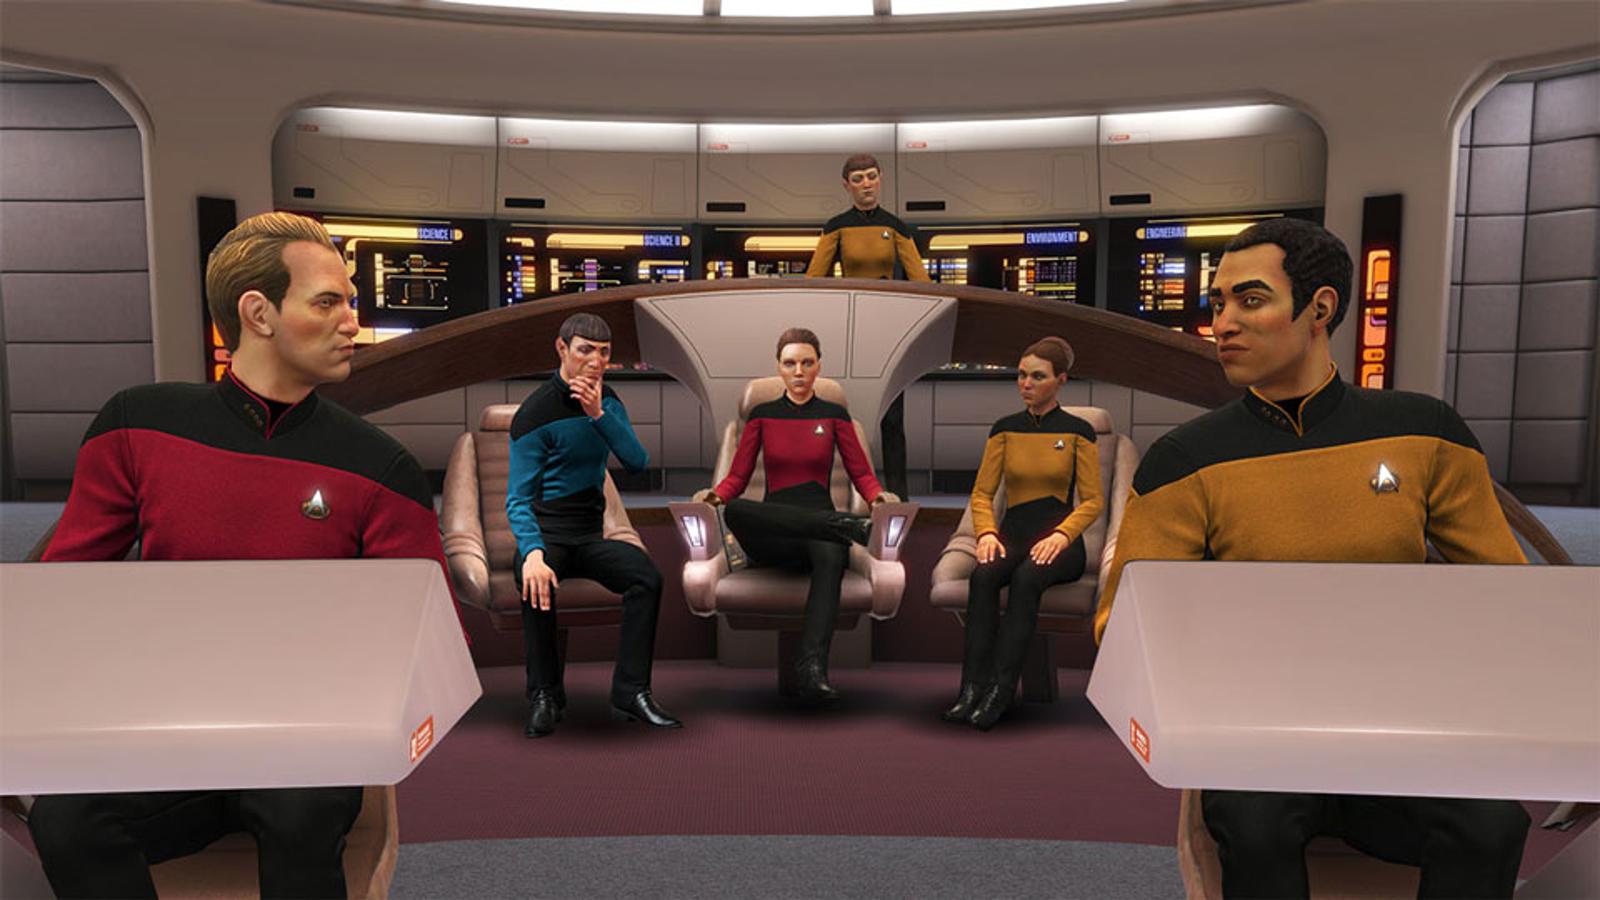 We Just Got A Good Star Trek: The Next Generation Video Game